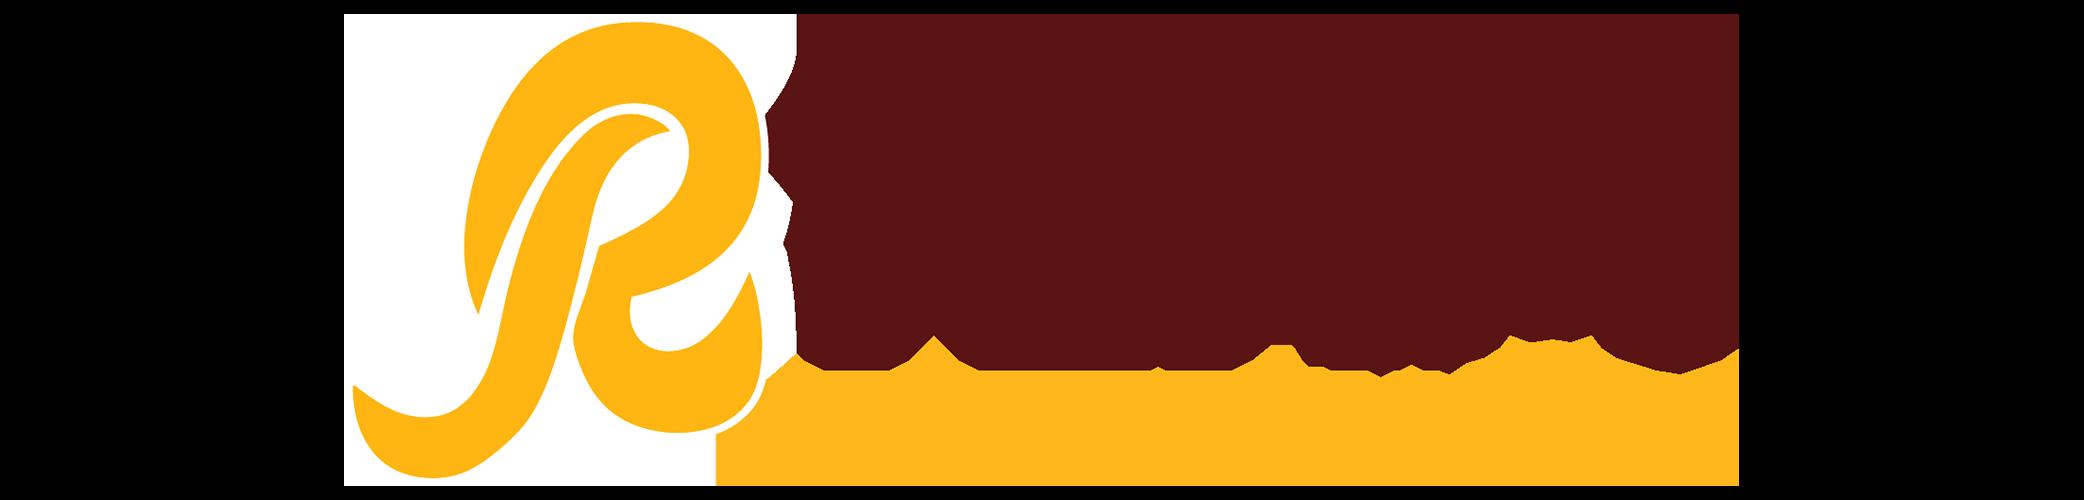 R_Team-logo2-02-v2